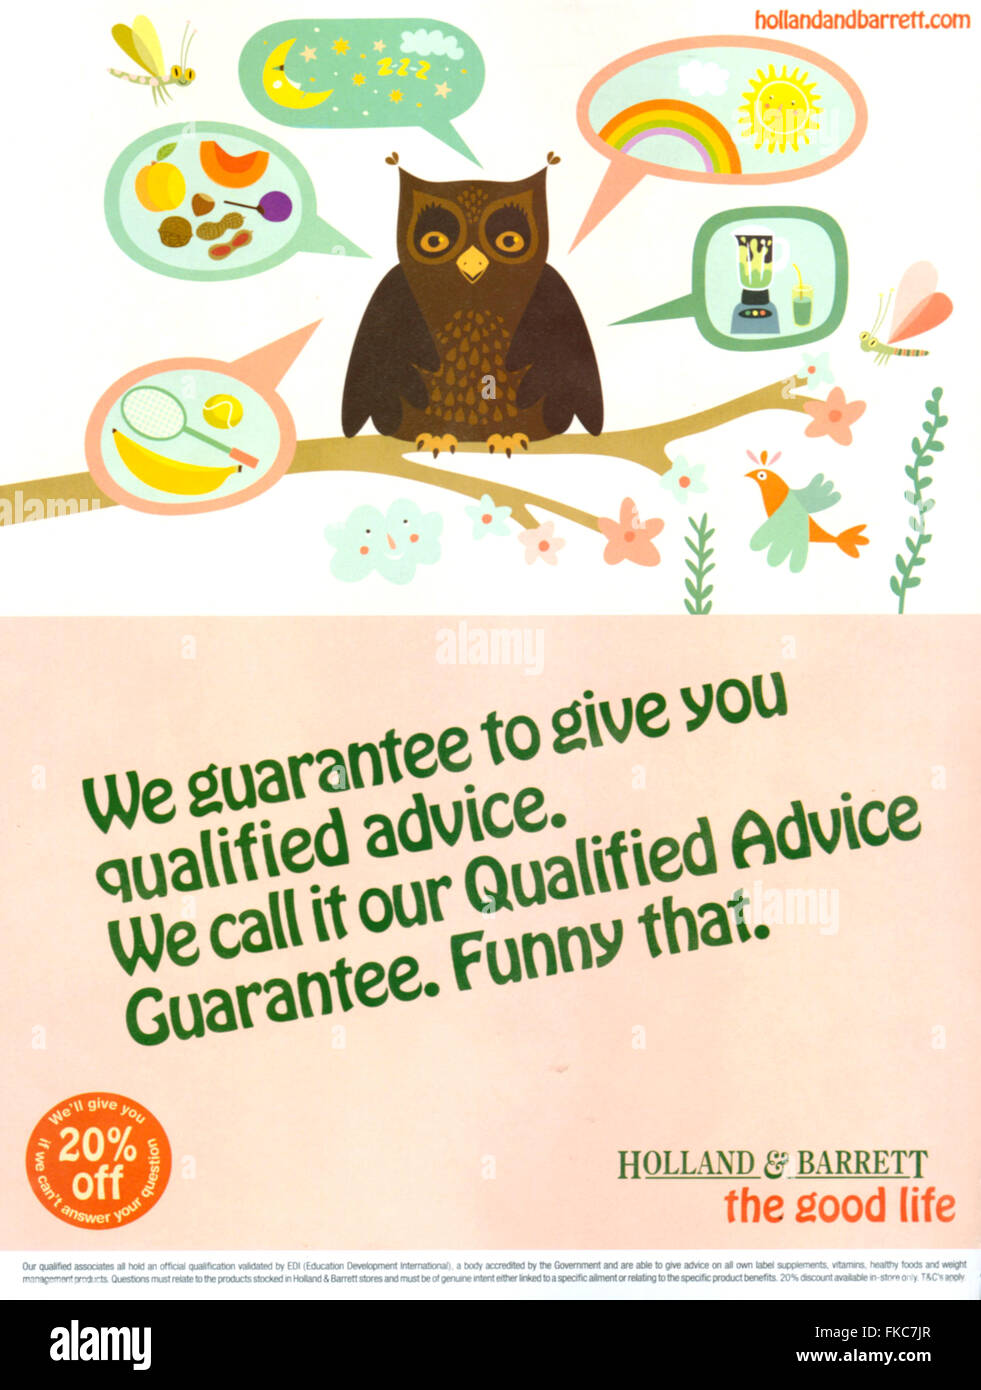 2010s UK Holland and Barrett Magazine Advert - Stock Image